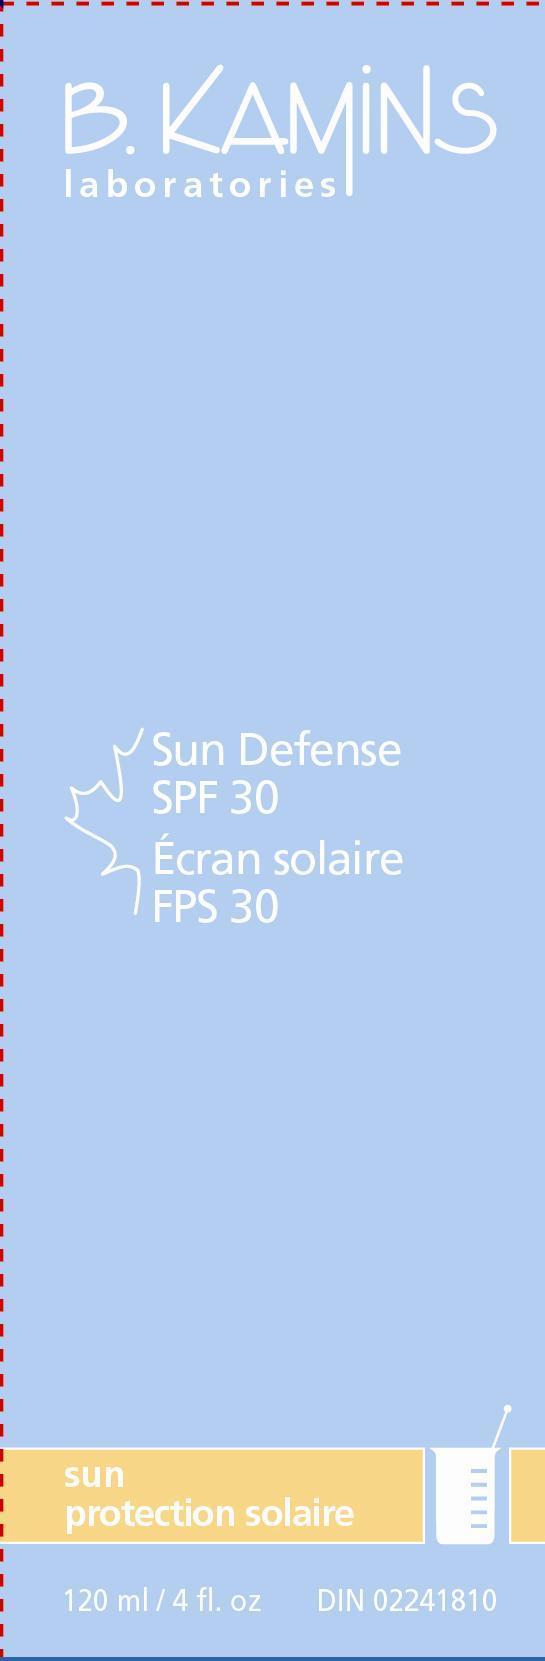 Sun Defense Spf 30 (Avobenzone Octinoxate Oxybenzone Titanium Dioxide) Lotion [Kamins Dermatologics Inc.]